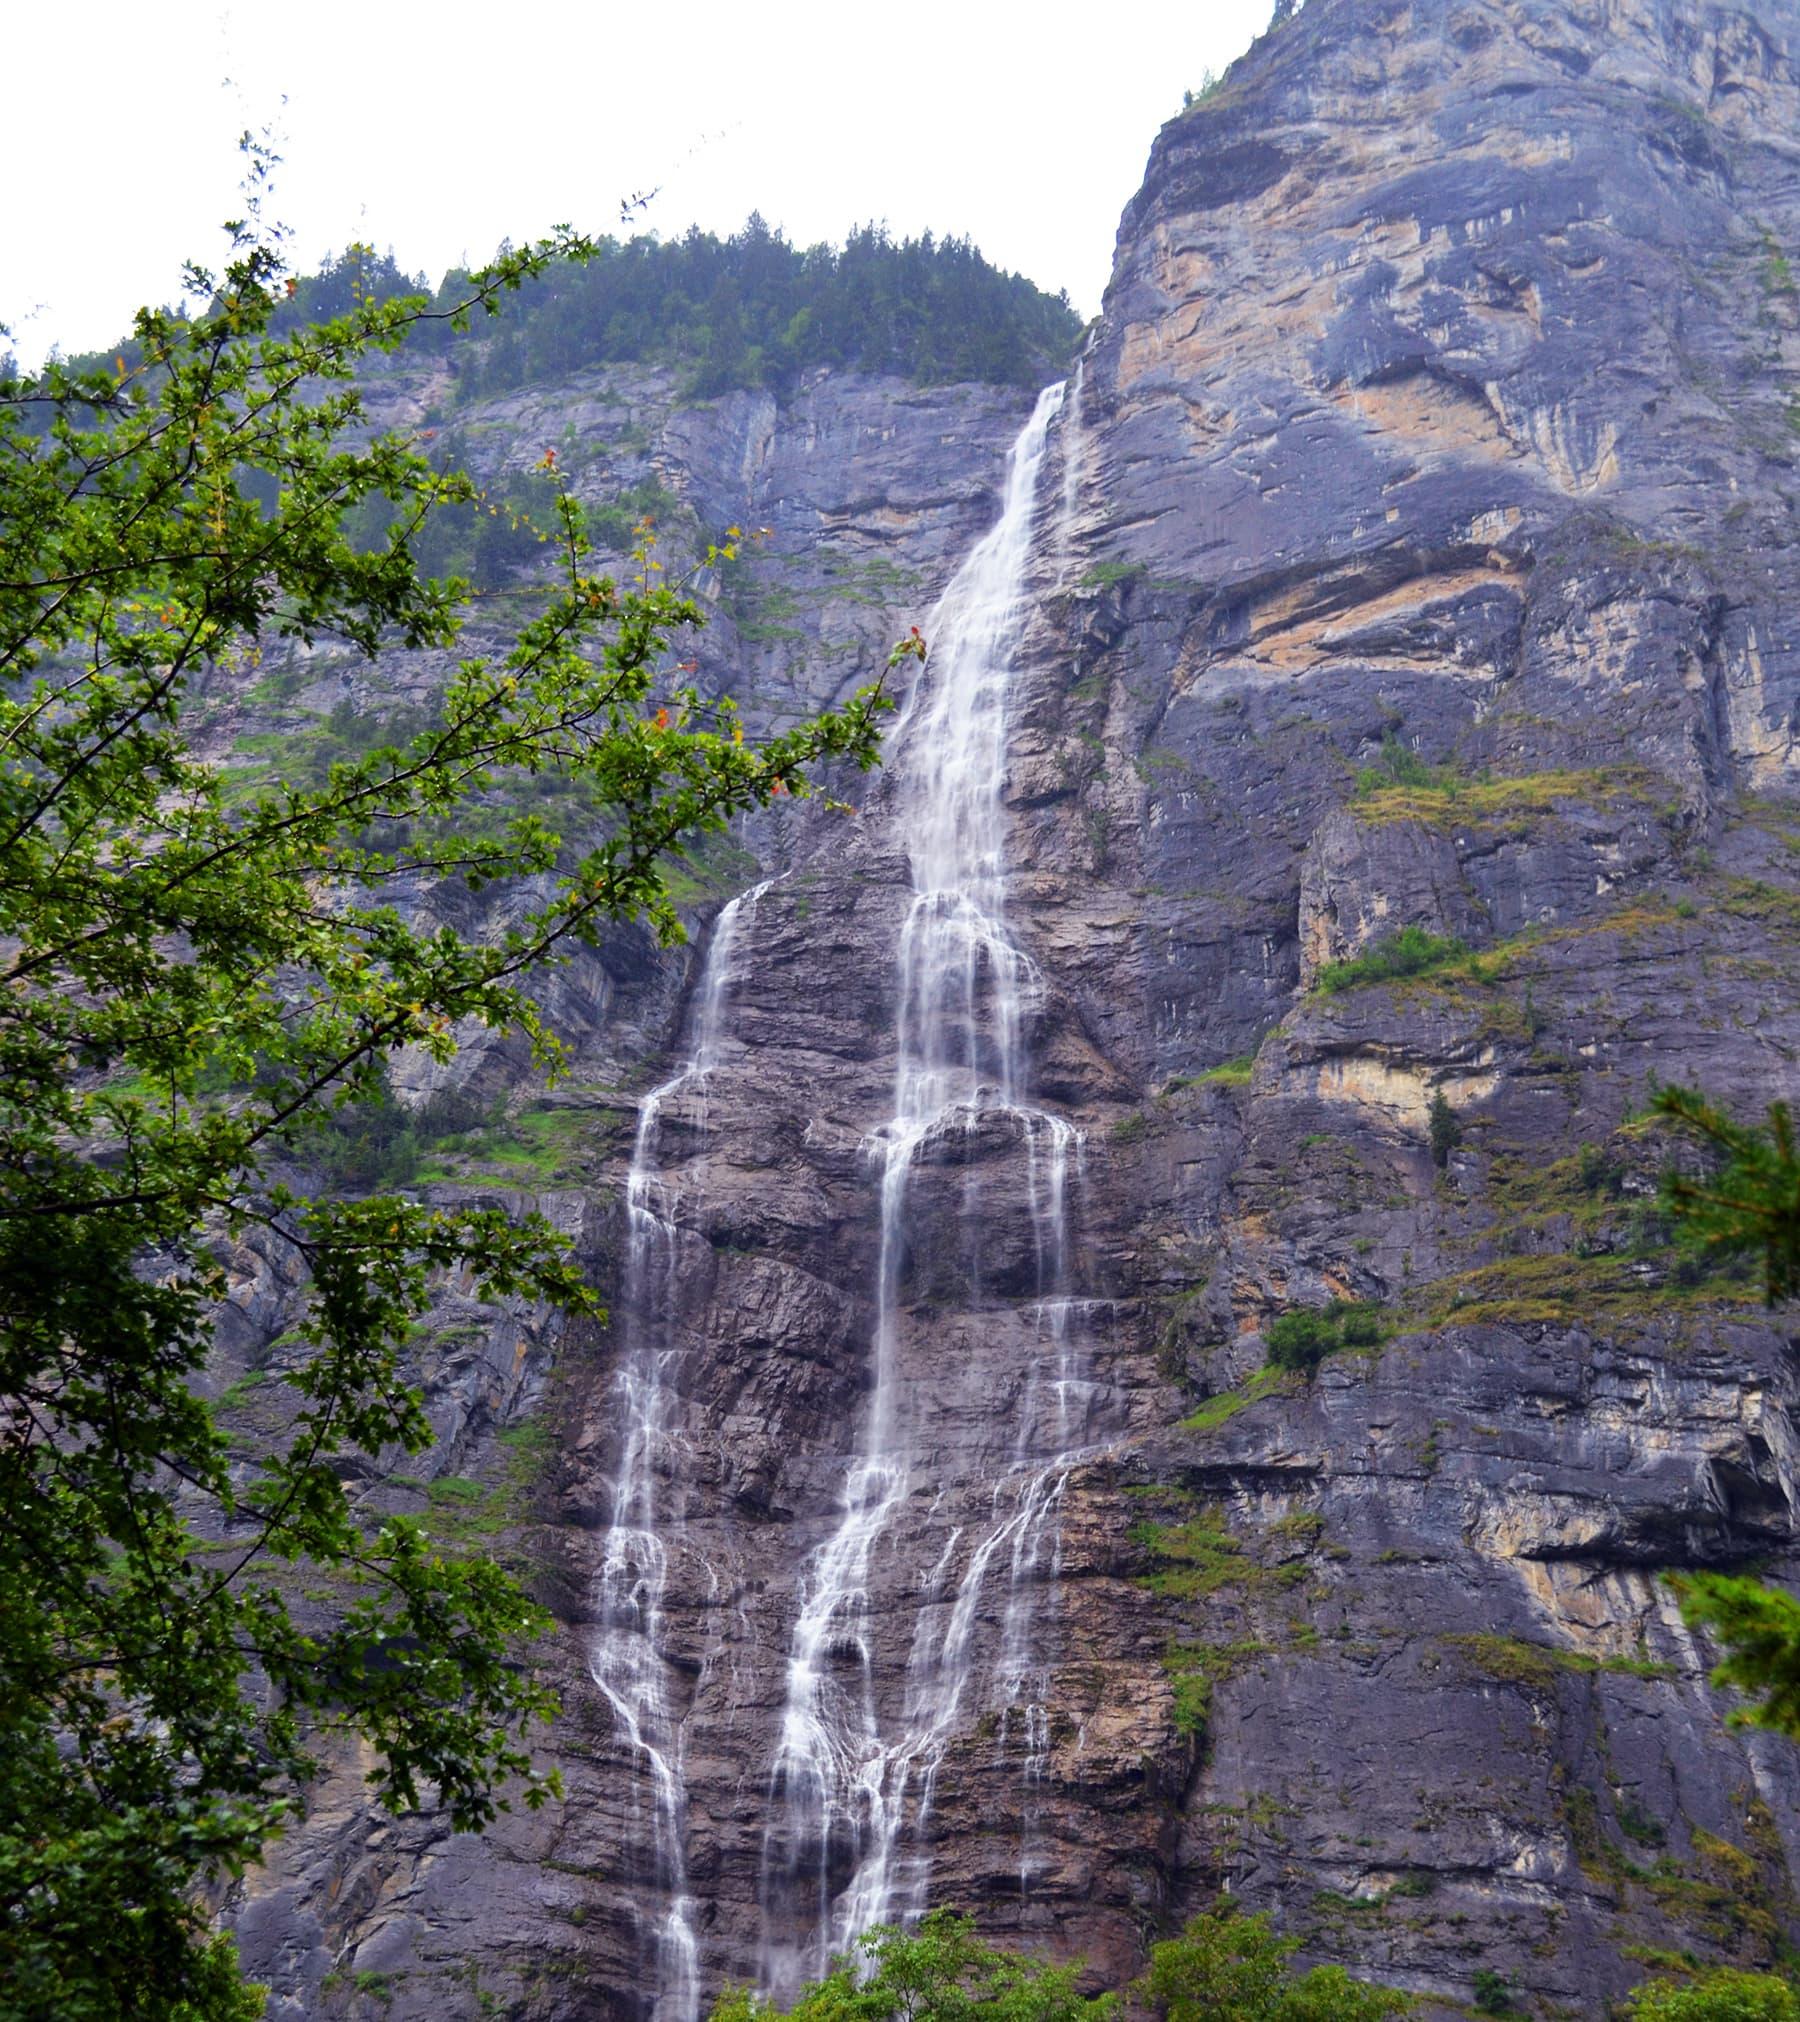 انٹر لاکن میں ایک آبشار — تصویر رمضان رفیق